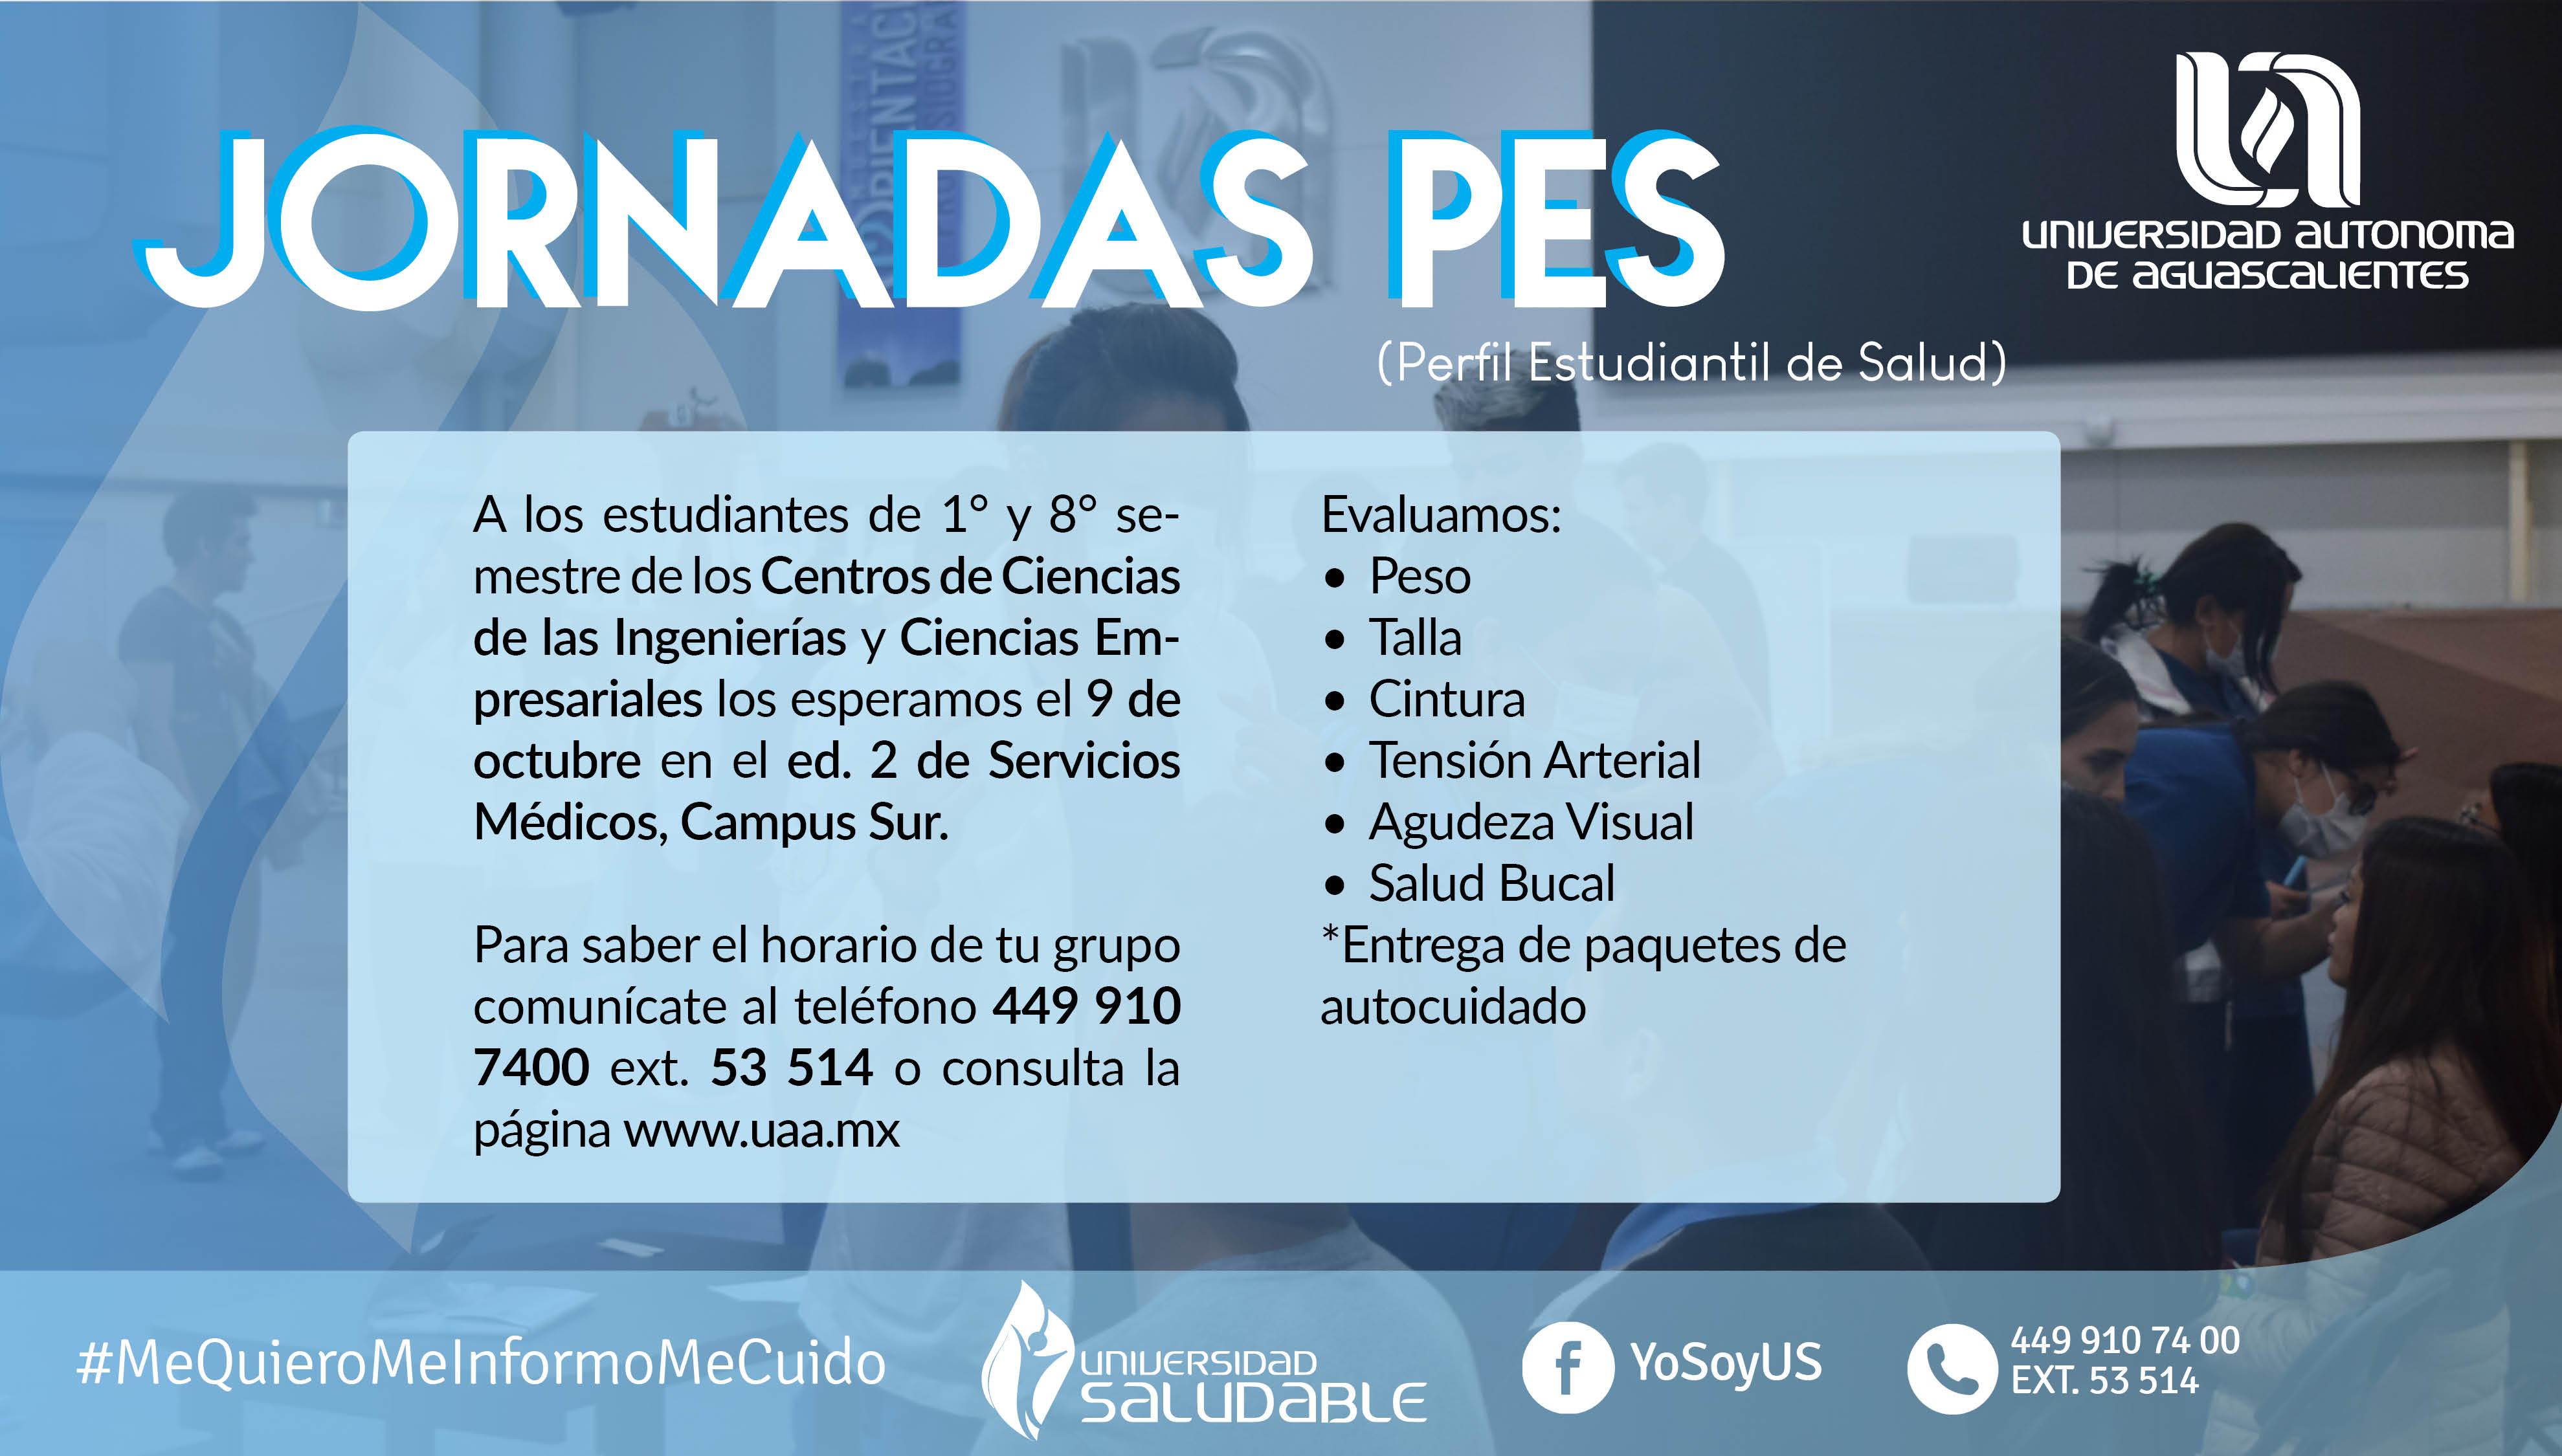 Jornadas PES (Perfil Estudiantil de Salud) CAMPUS SUR